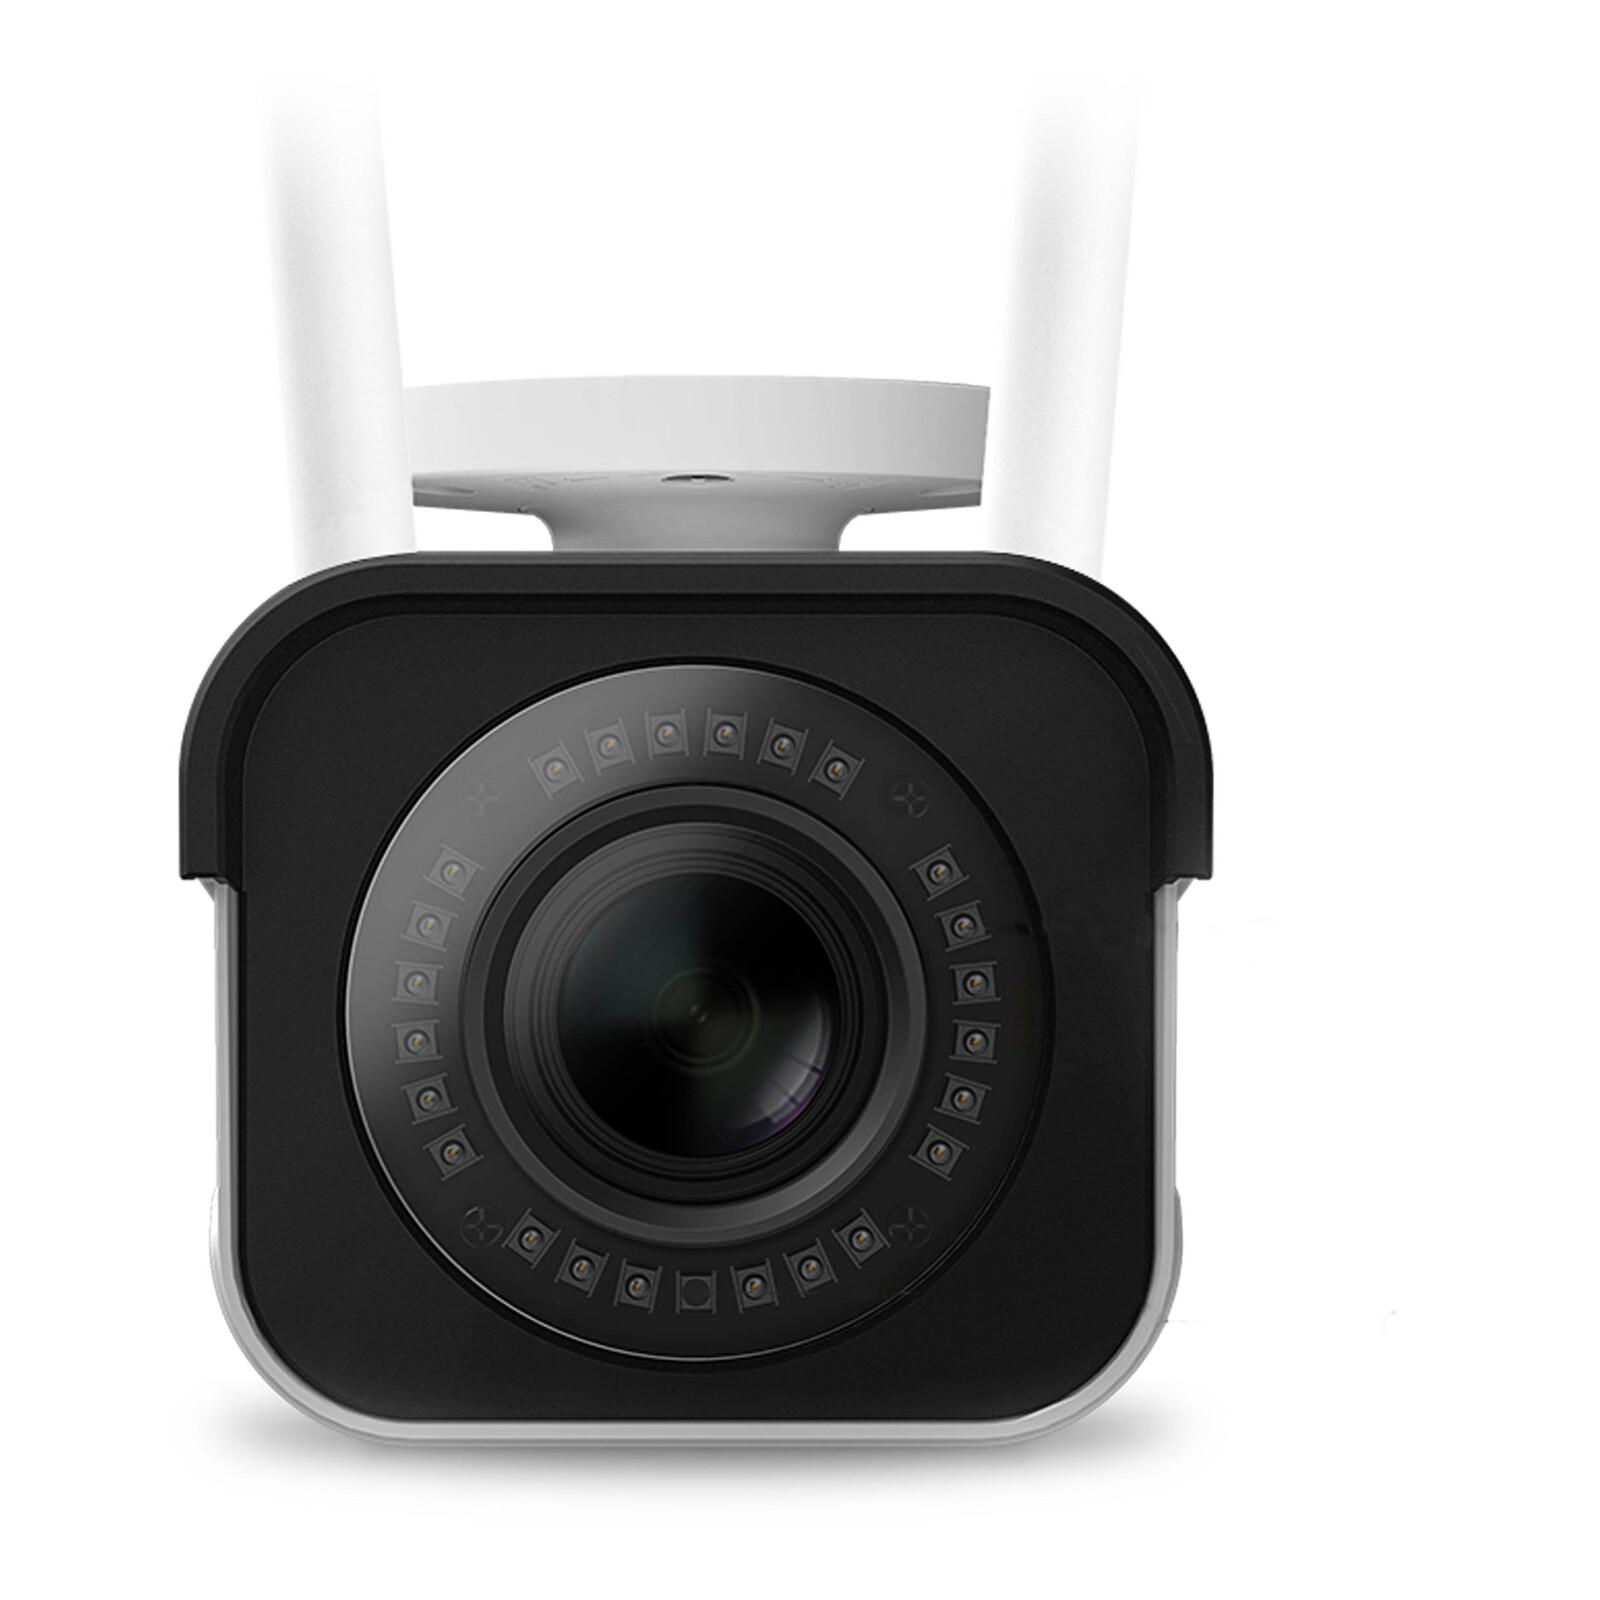 Reolink RLC-511W inkl. 64GB Mikro-SD-Karte